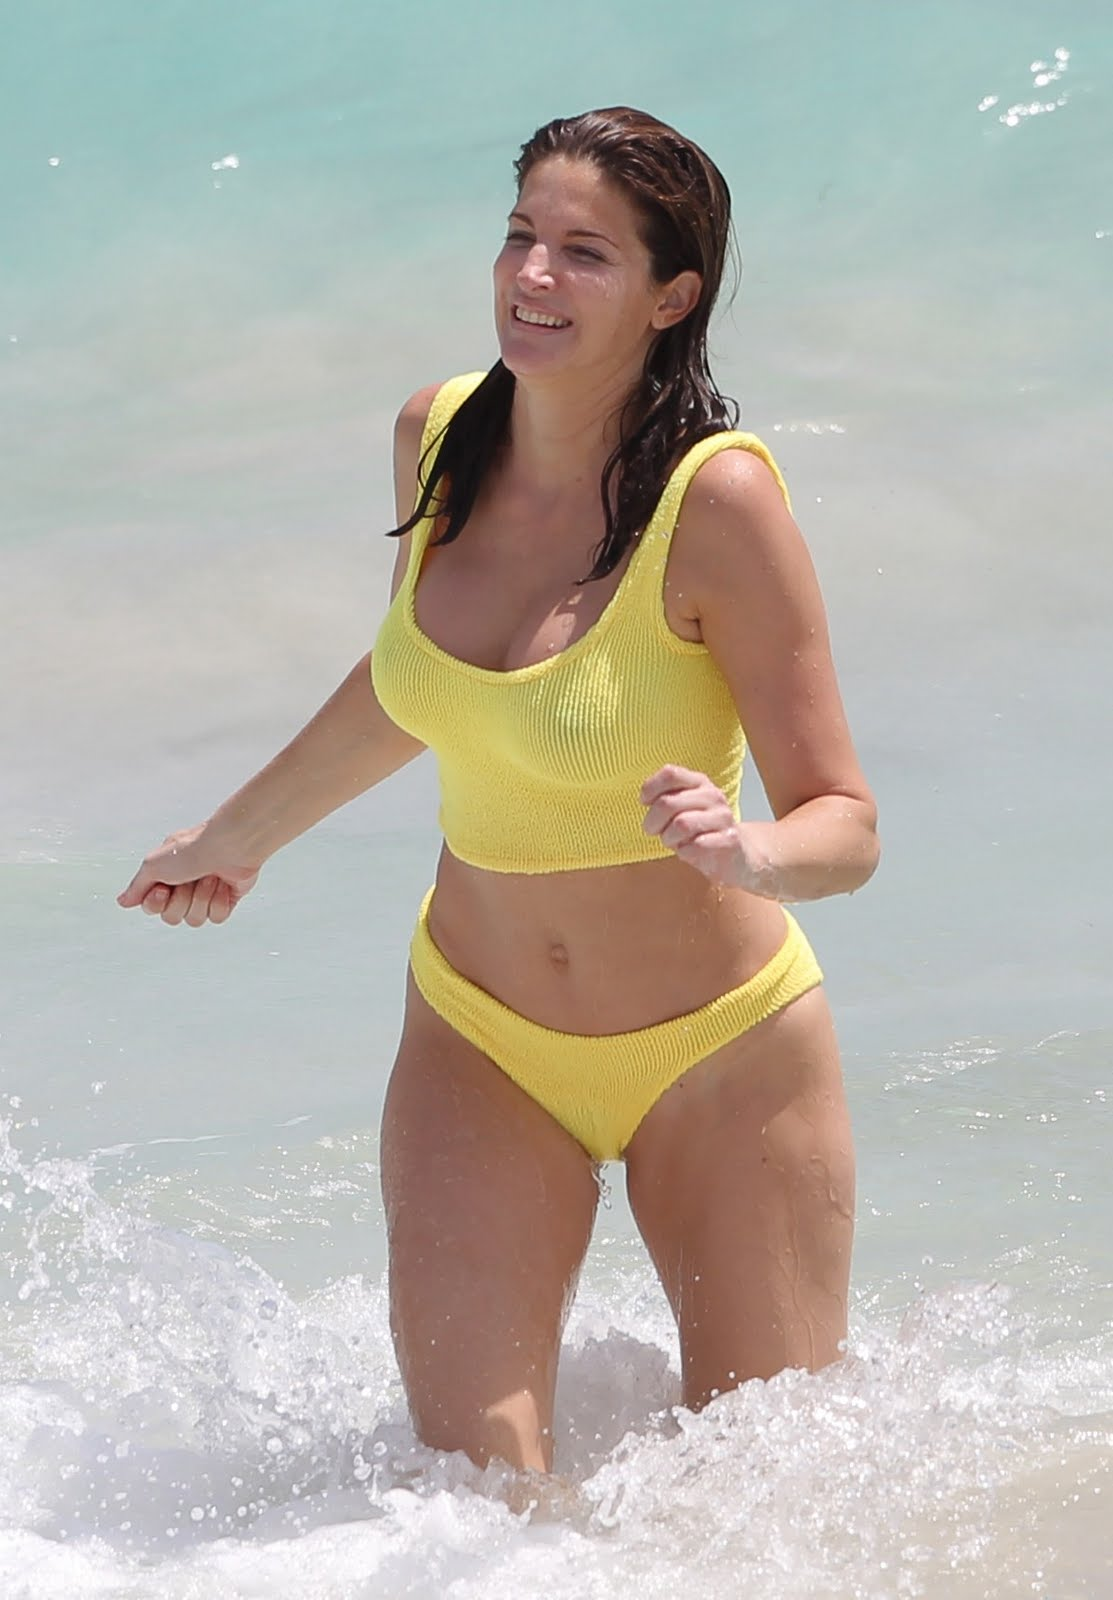 http://1.bp.blogspot.com/-4rJpML6GgWg/TdvcMDUjQjI/AAAAAAAACKA/Dqe3kMM1-vs/s1600/Stephanie+Seymour+in+Bikini+8.jpg